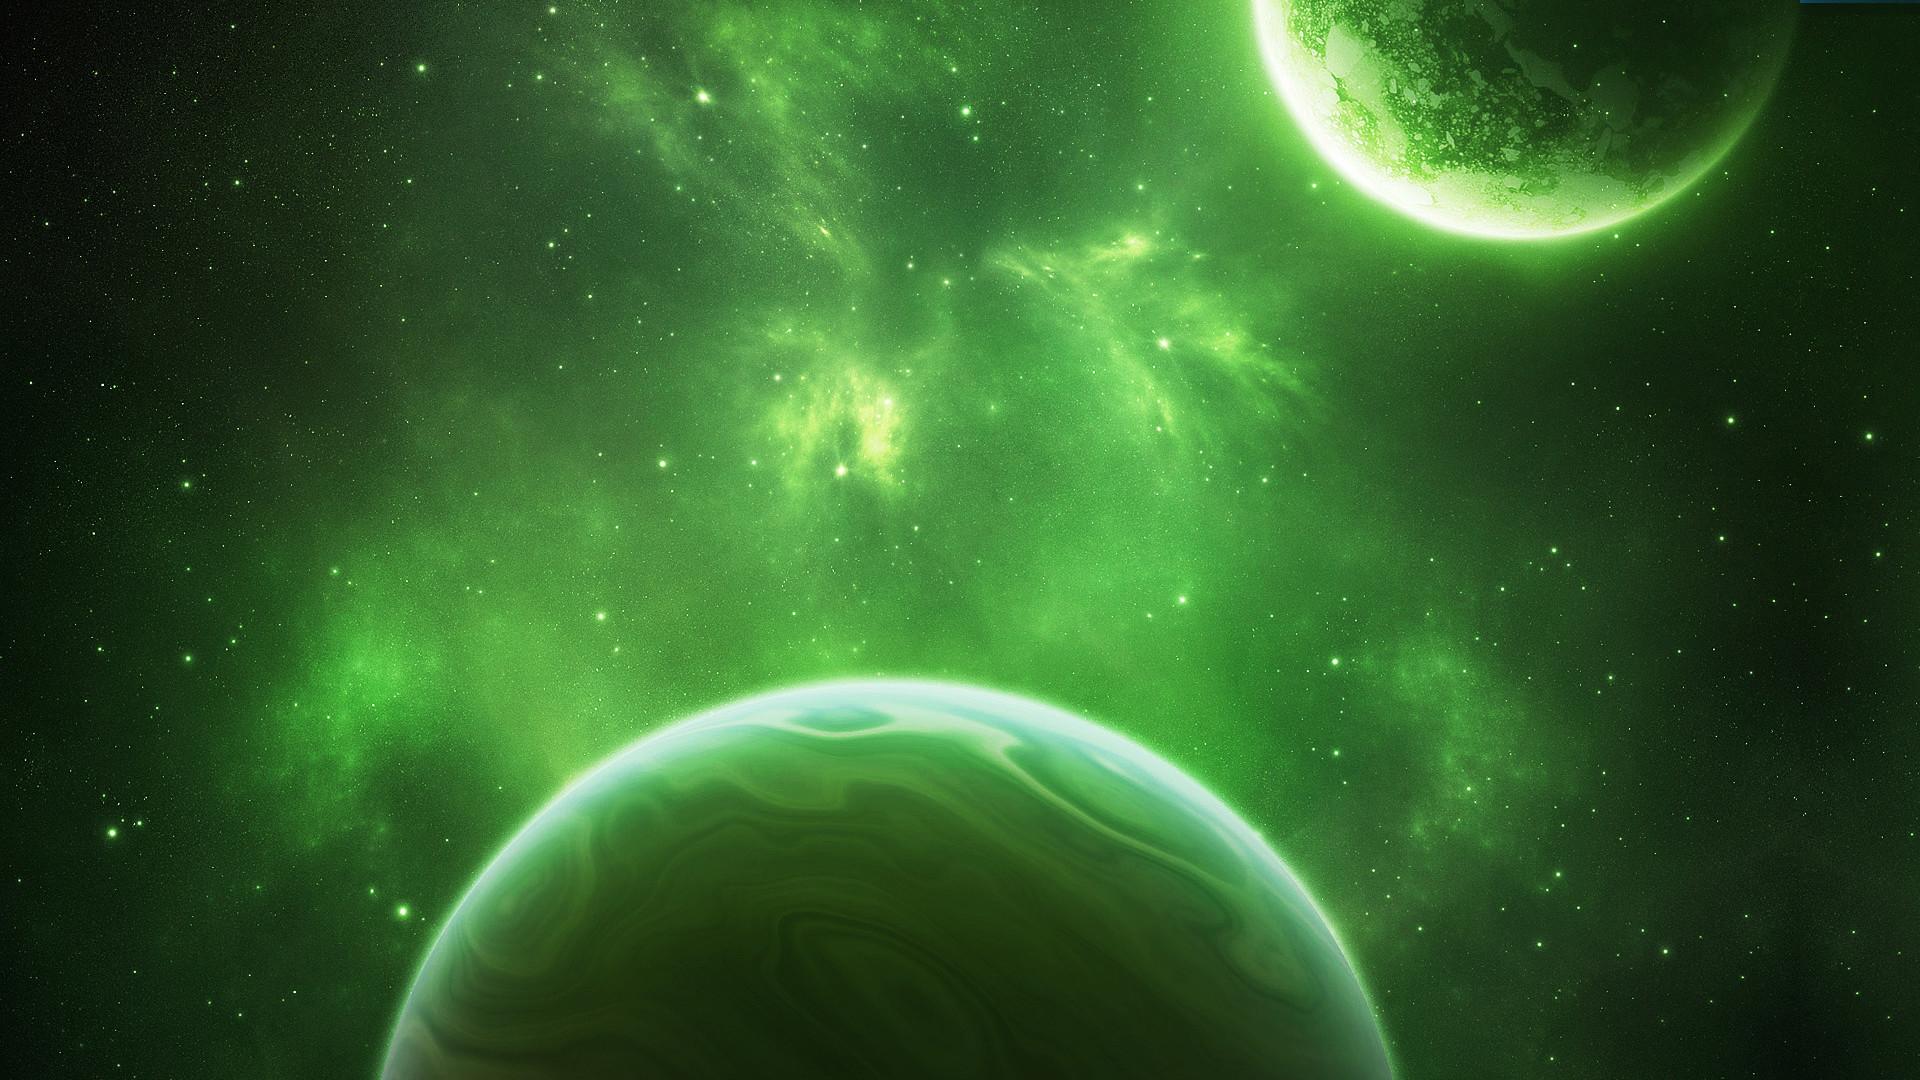 Green Space Wallpaper. 1920×1080